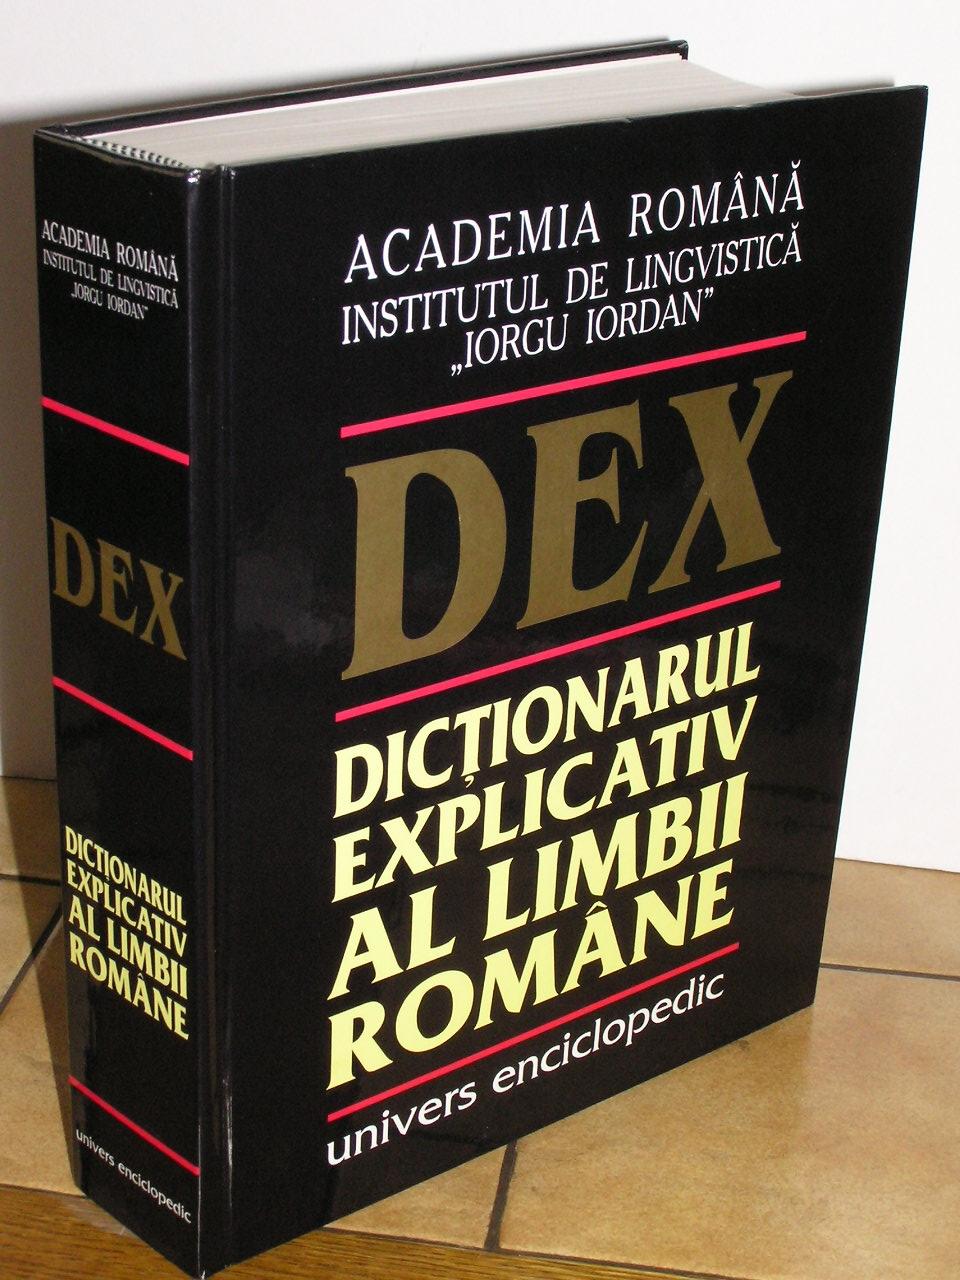 dex on line